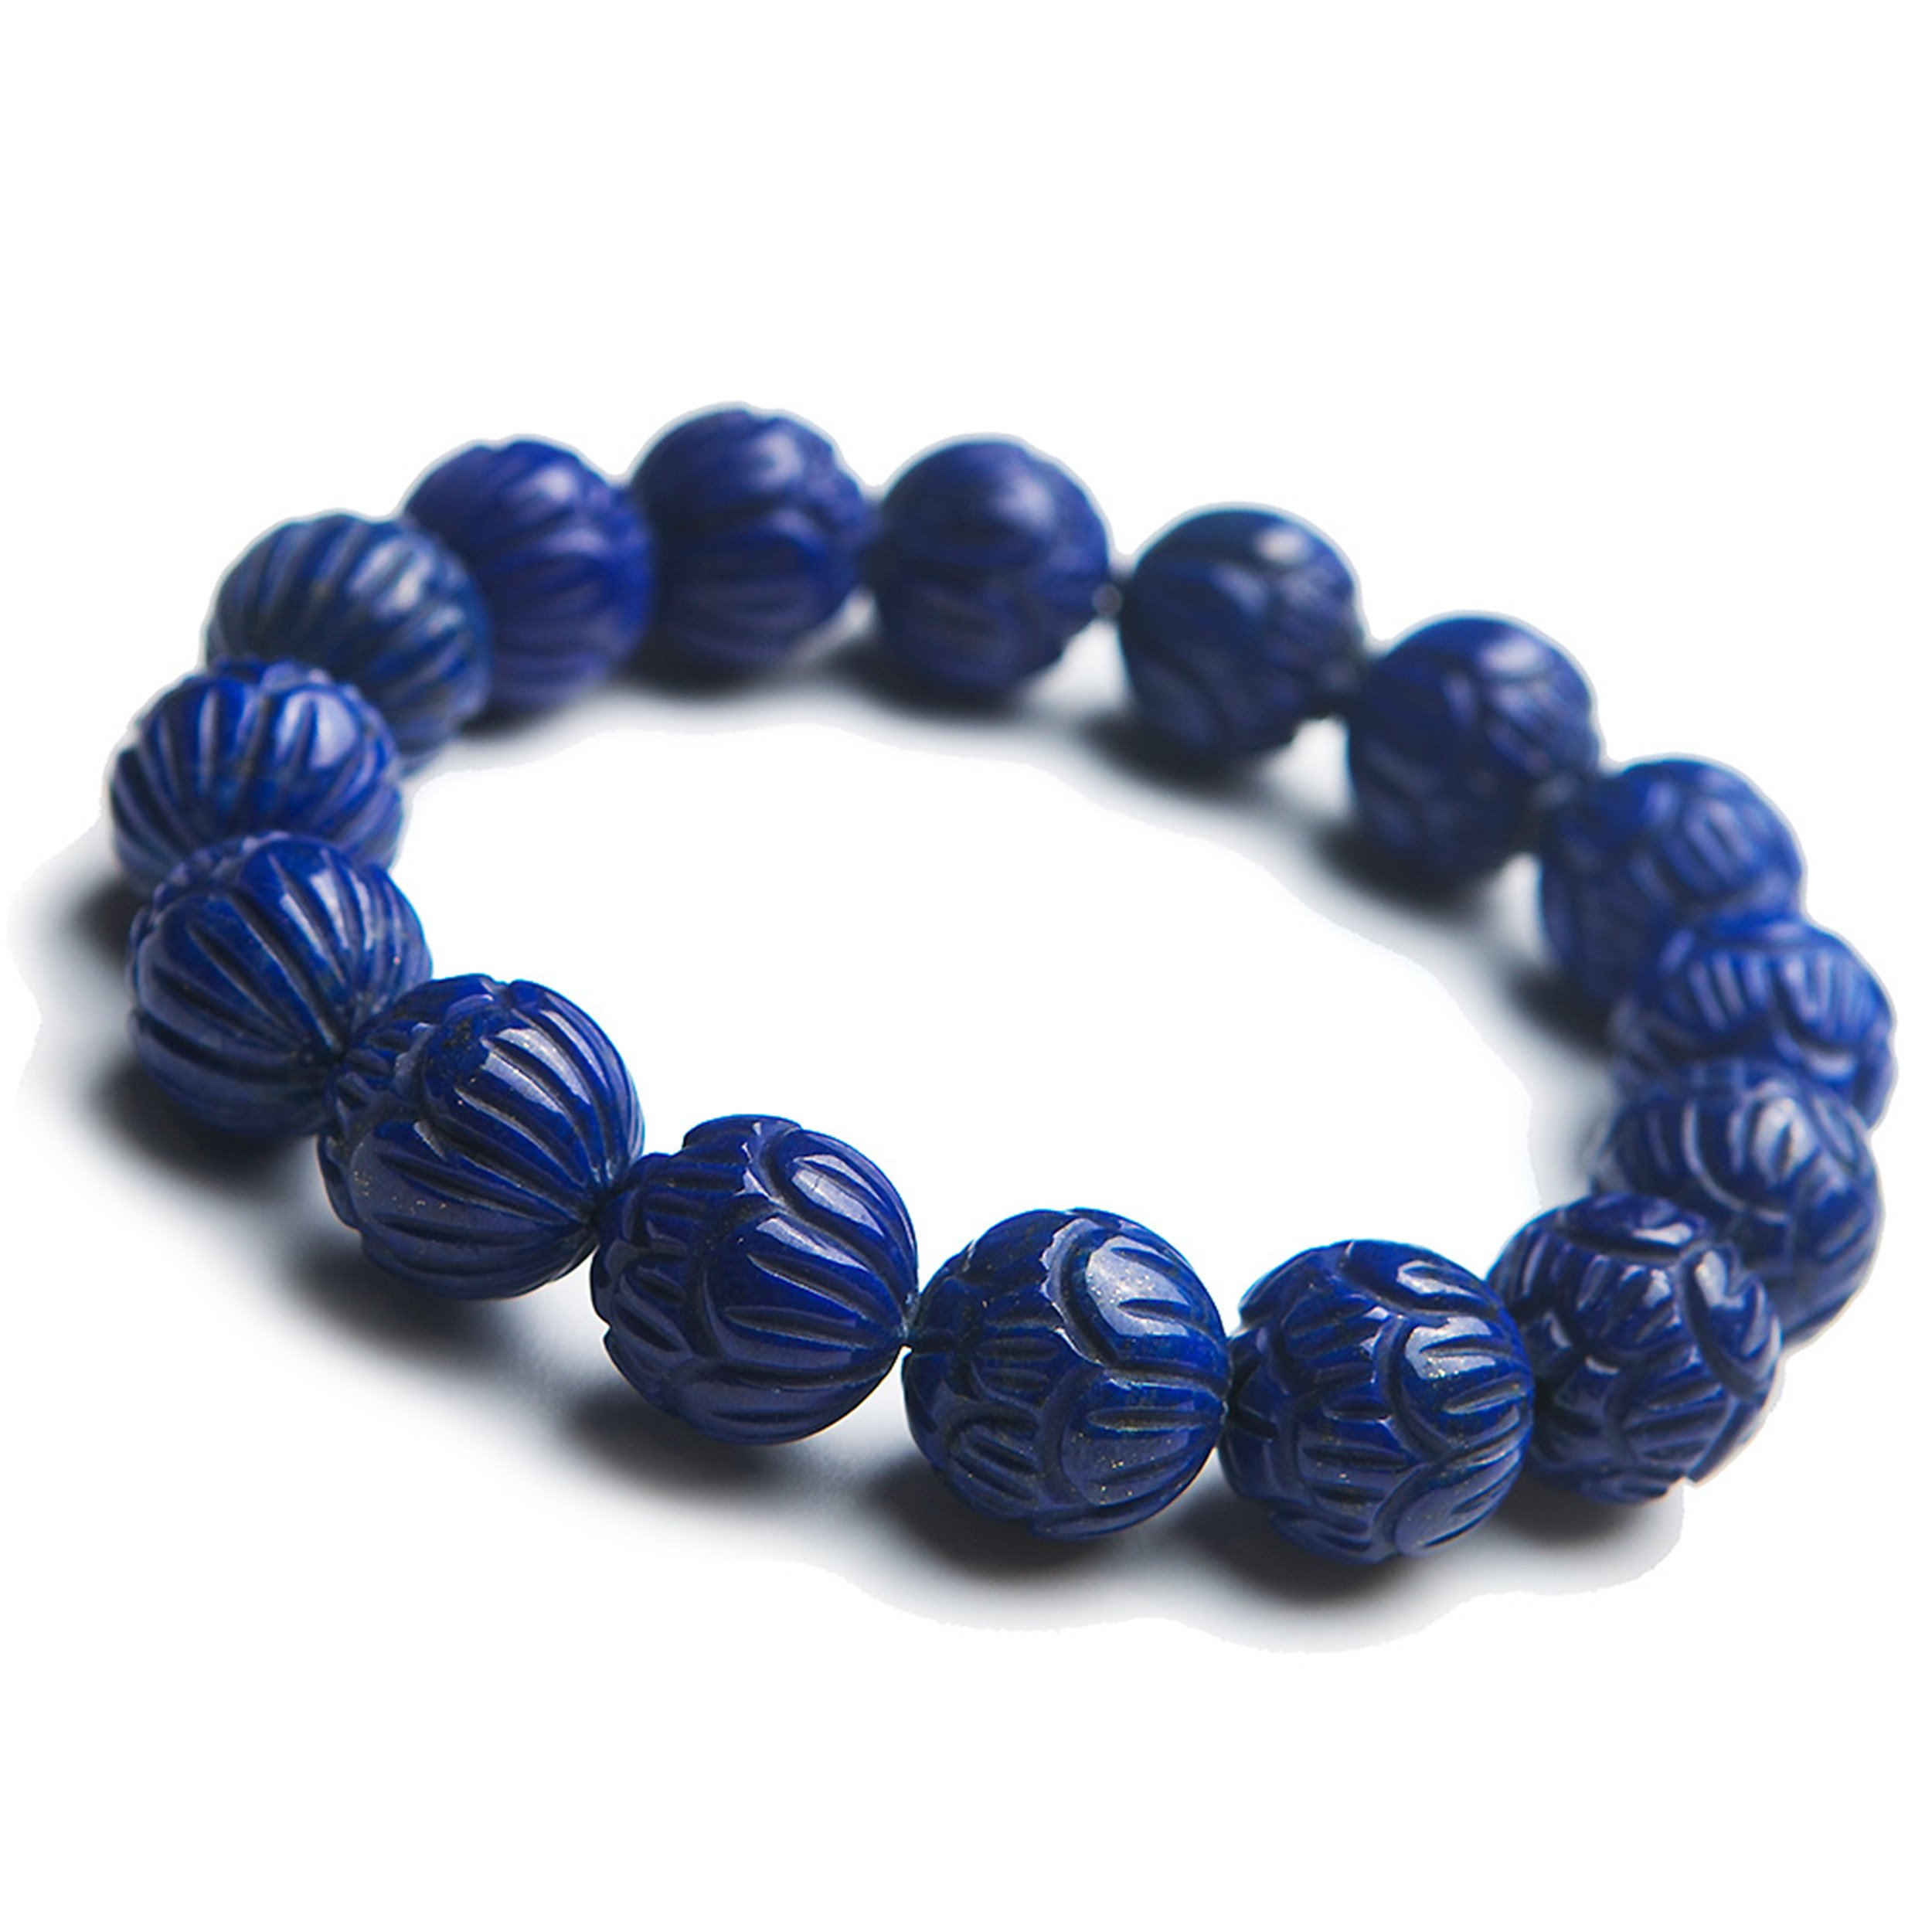 Genuine Blue Natural Lapis Lazuli Gemstone Crystal Round Bead Stretch Bracelet 13mm